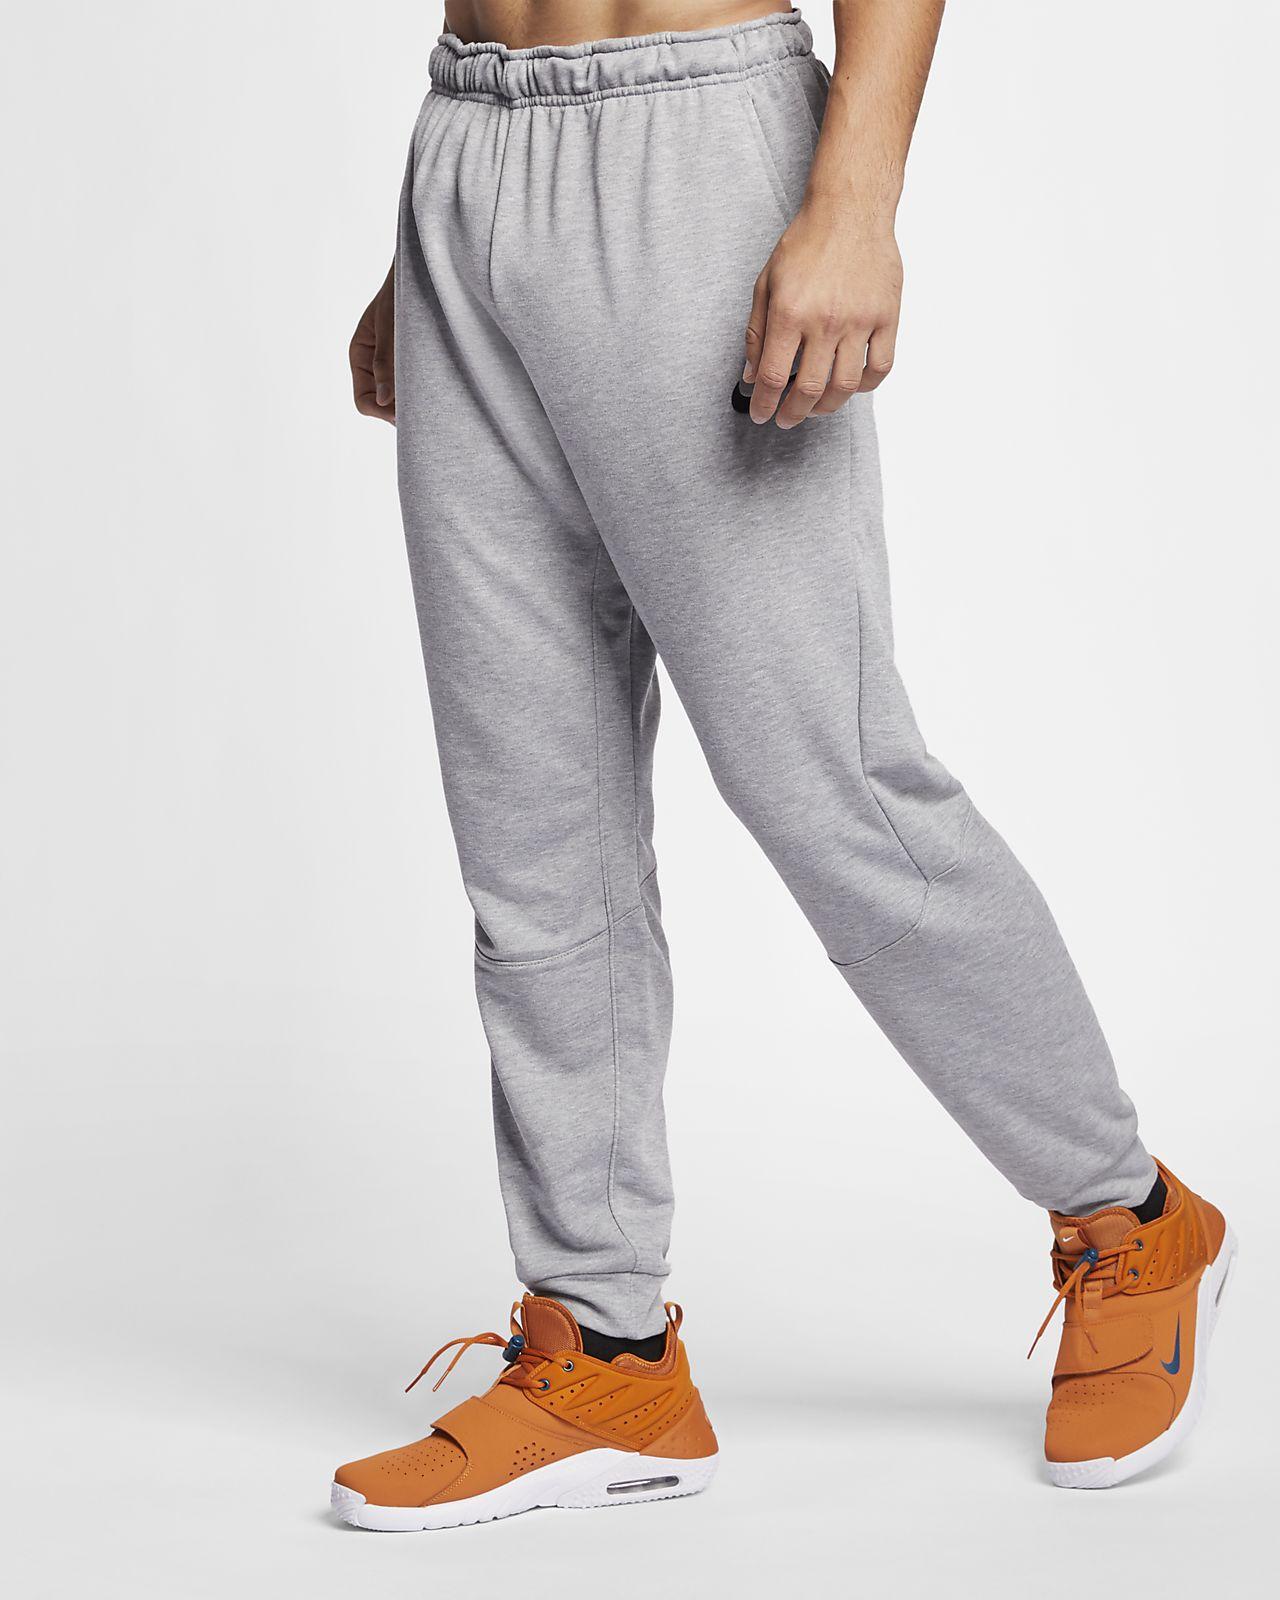 pantalon nike homme orange